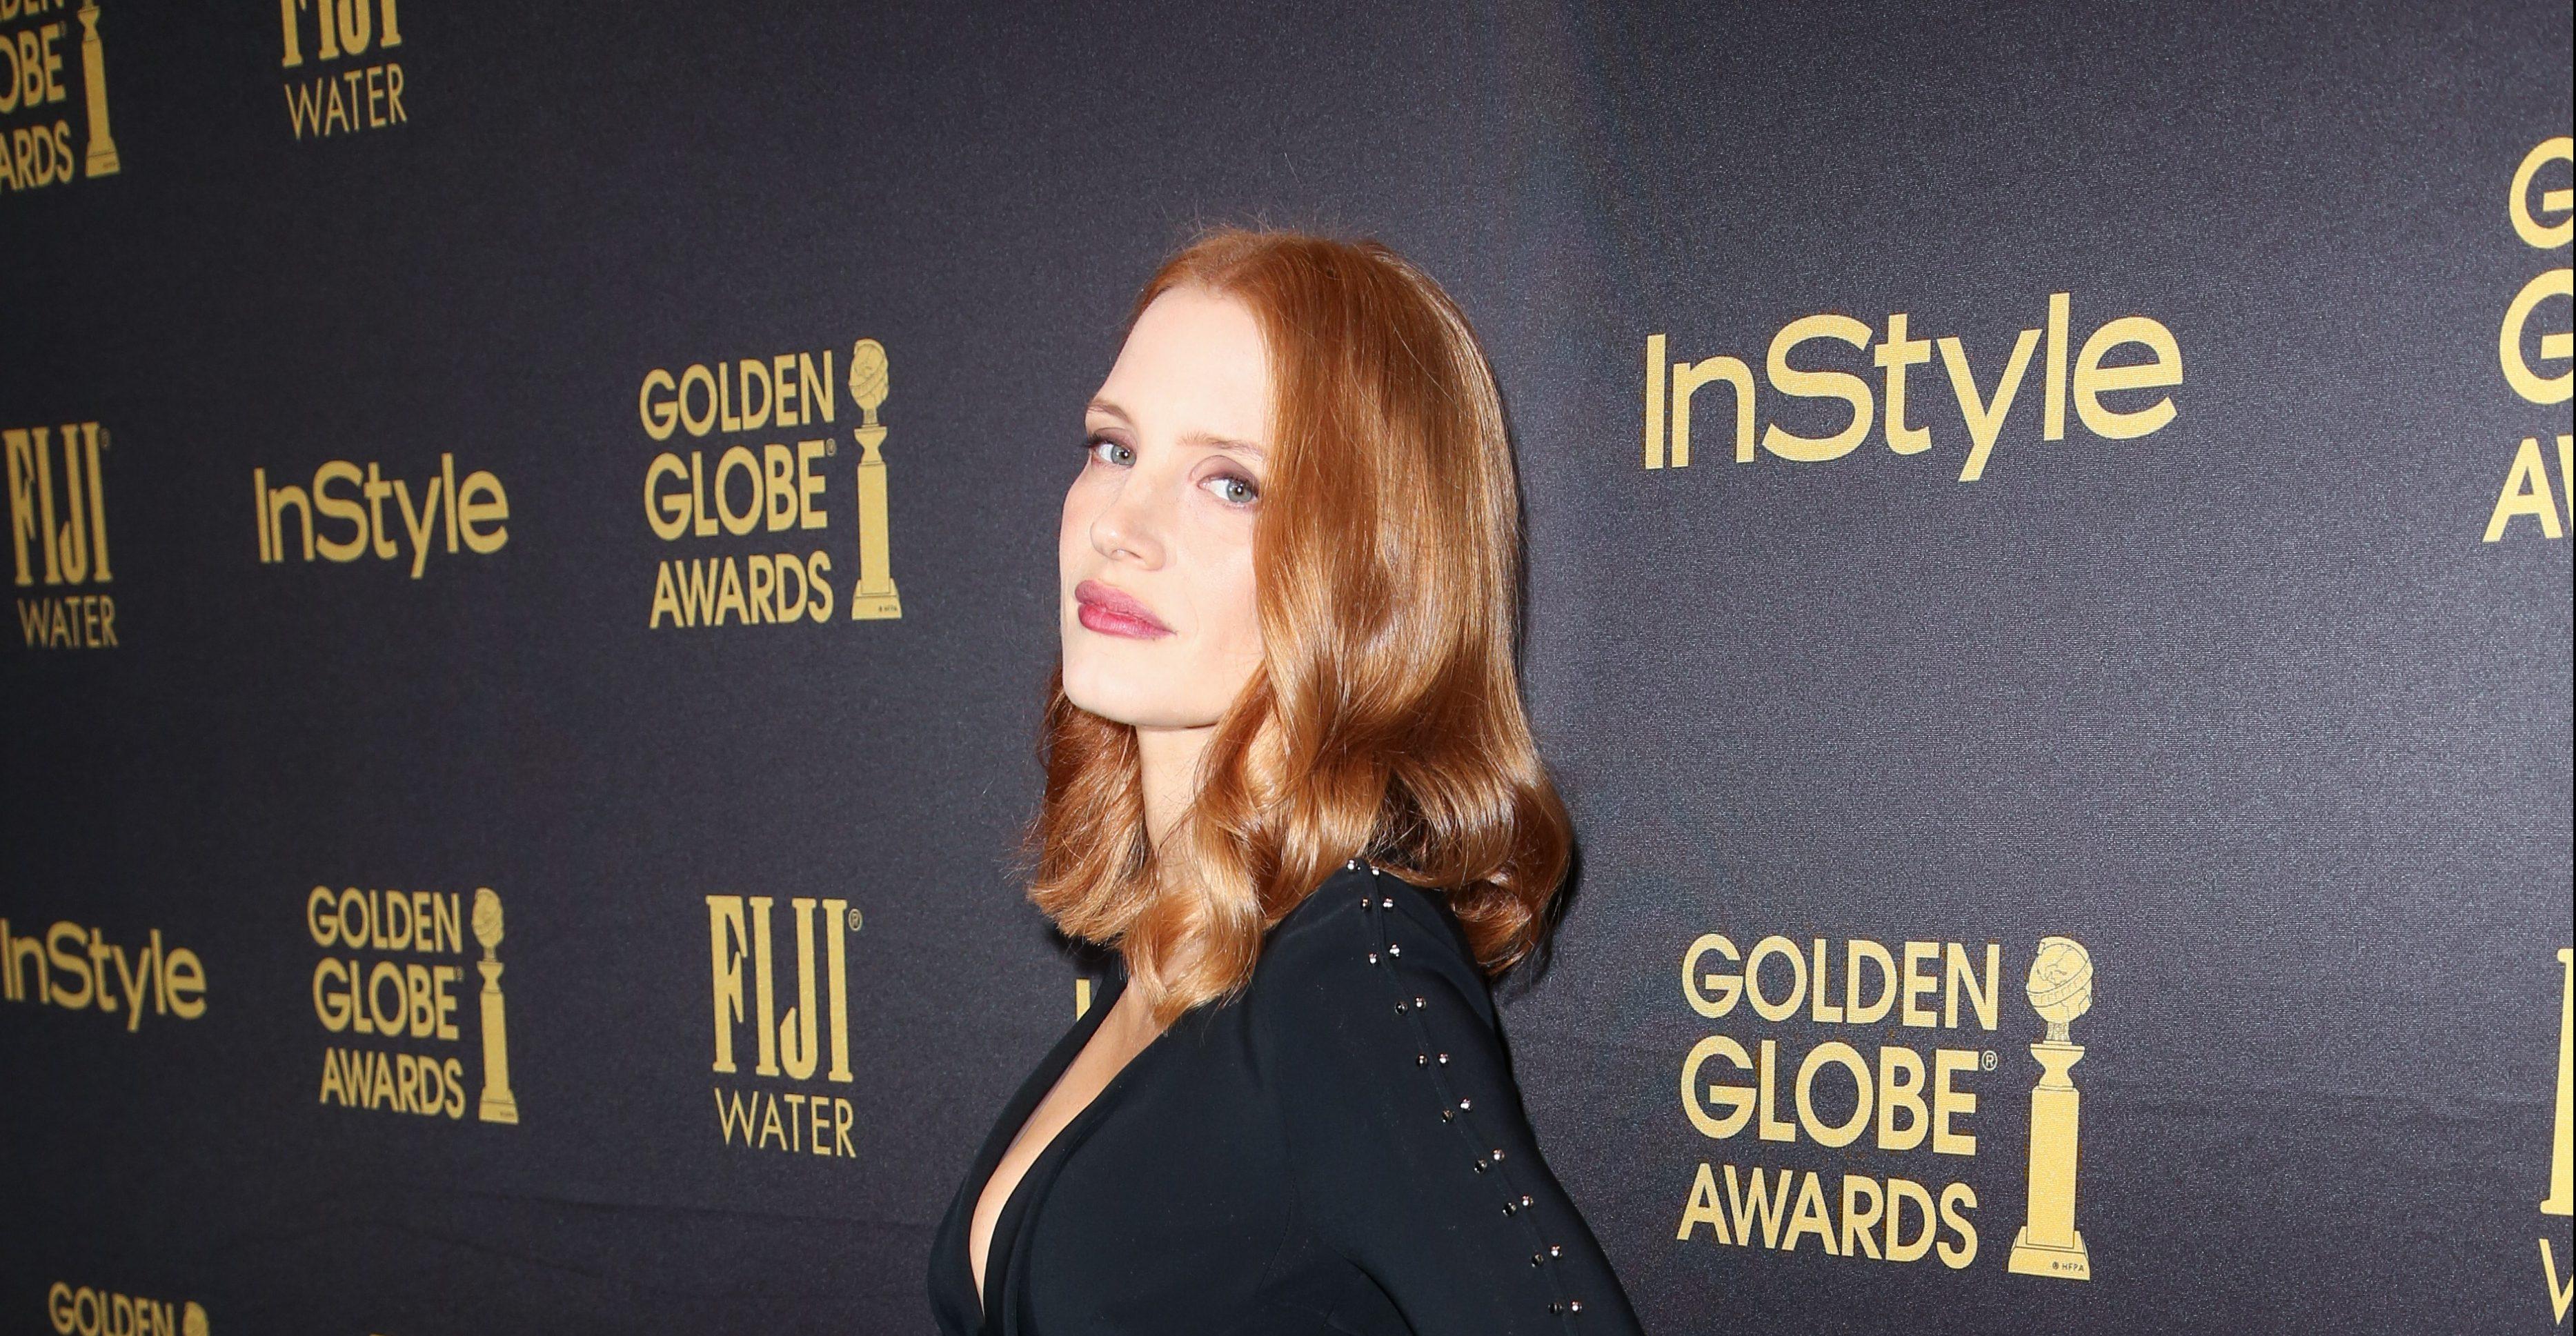 Jessica participa do Celebration of the 2017 Golden Globe Awards Season